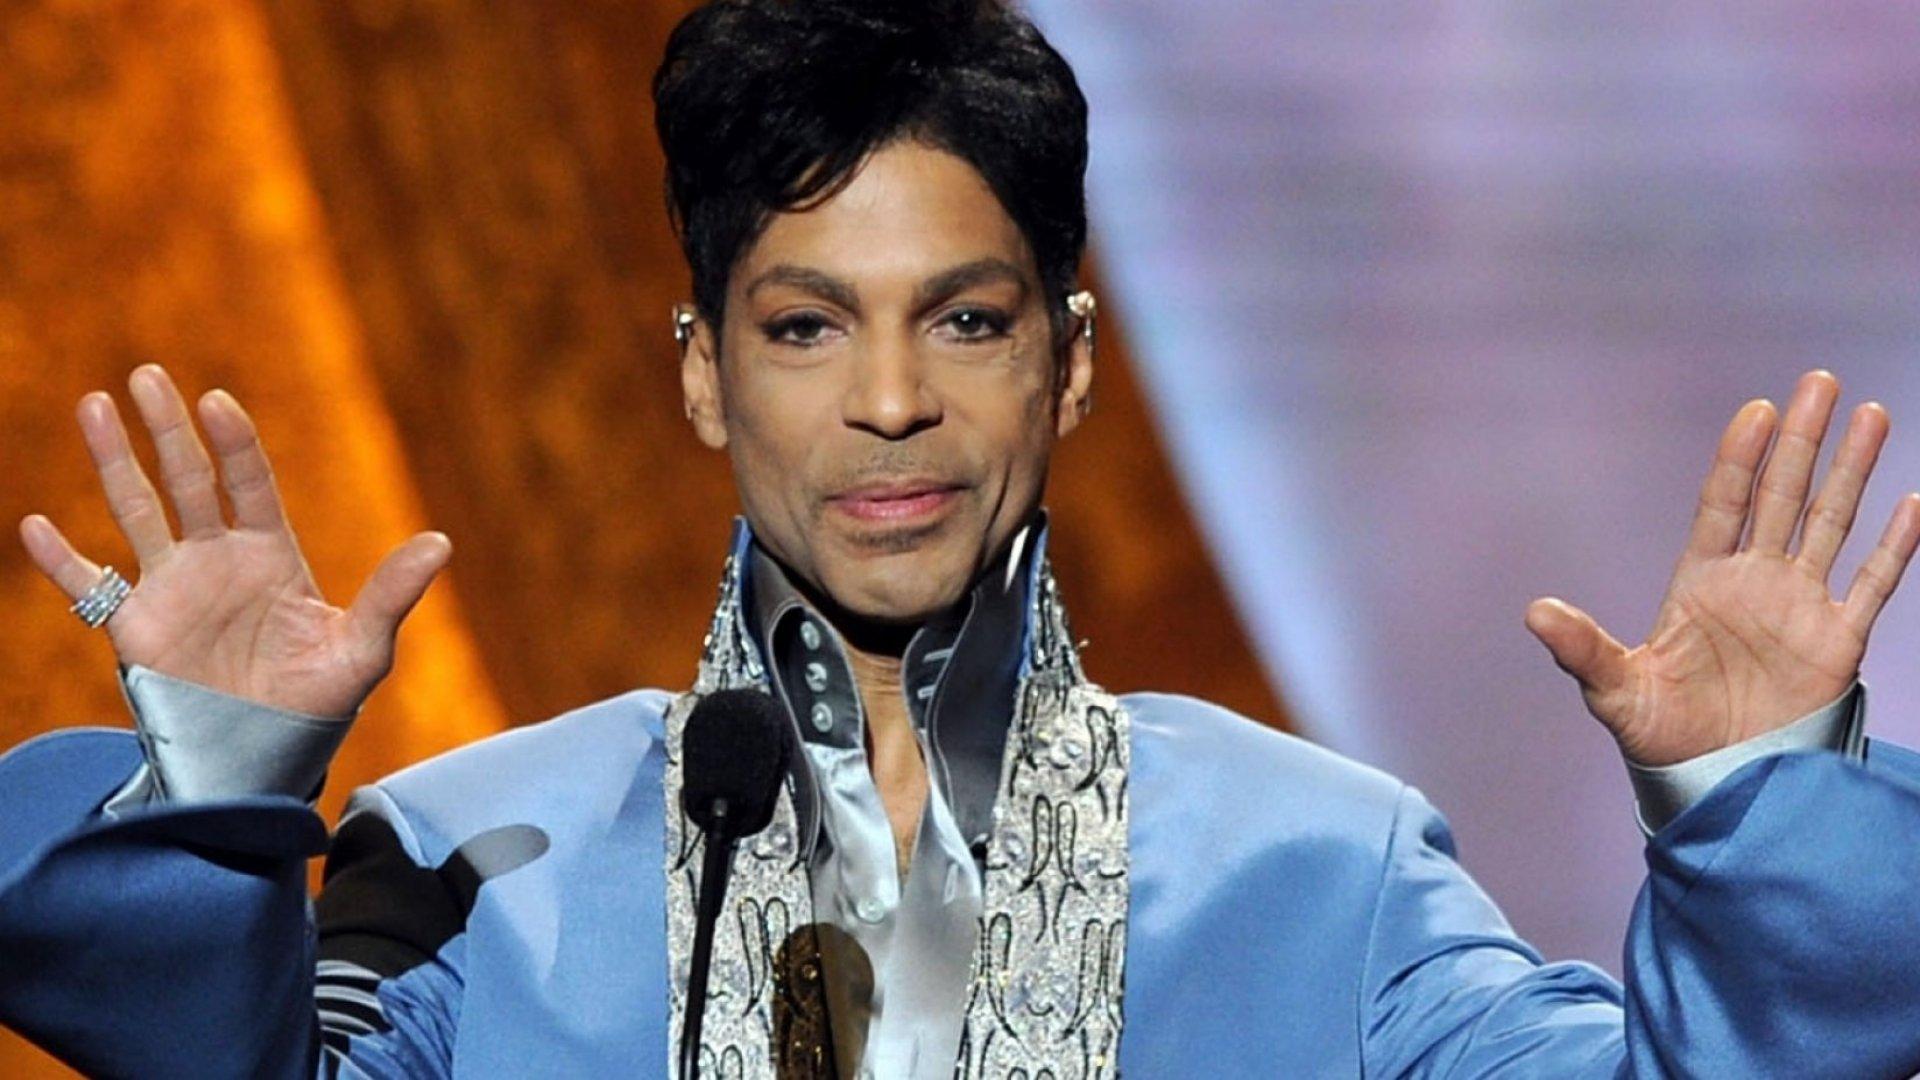 5 Creativity Tips From Prince's Stellar Career